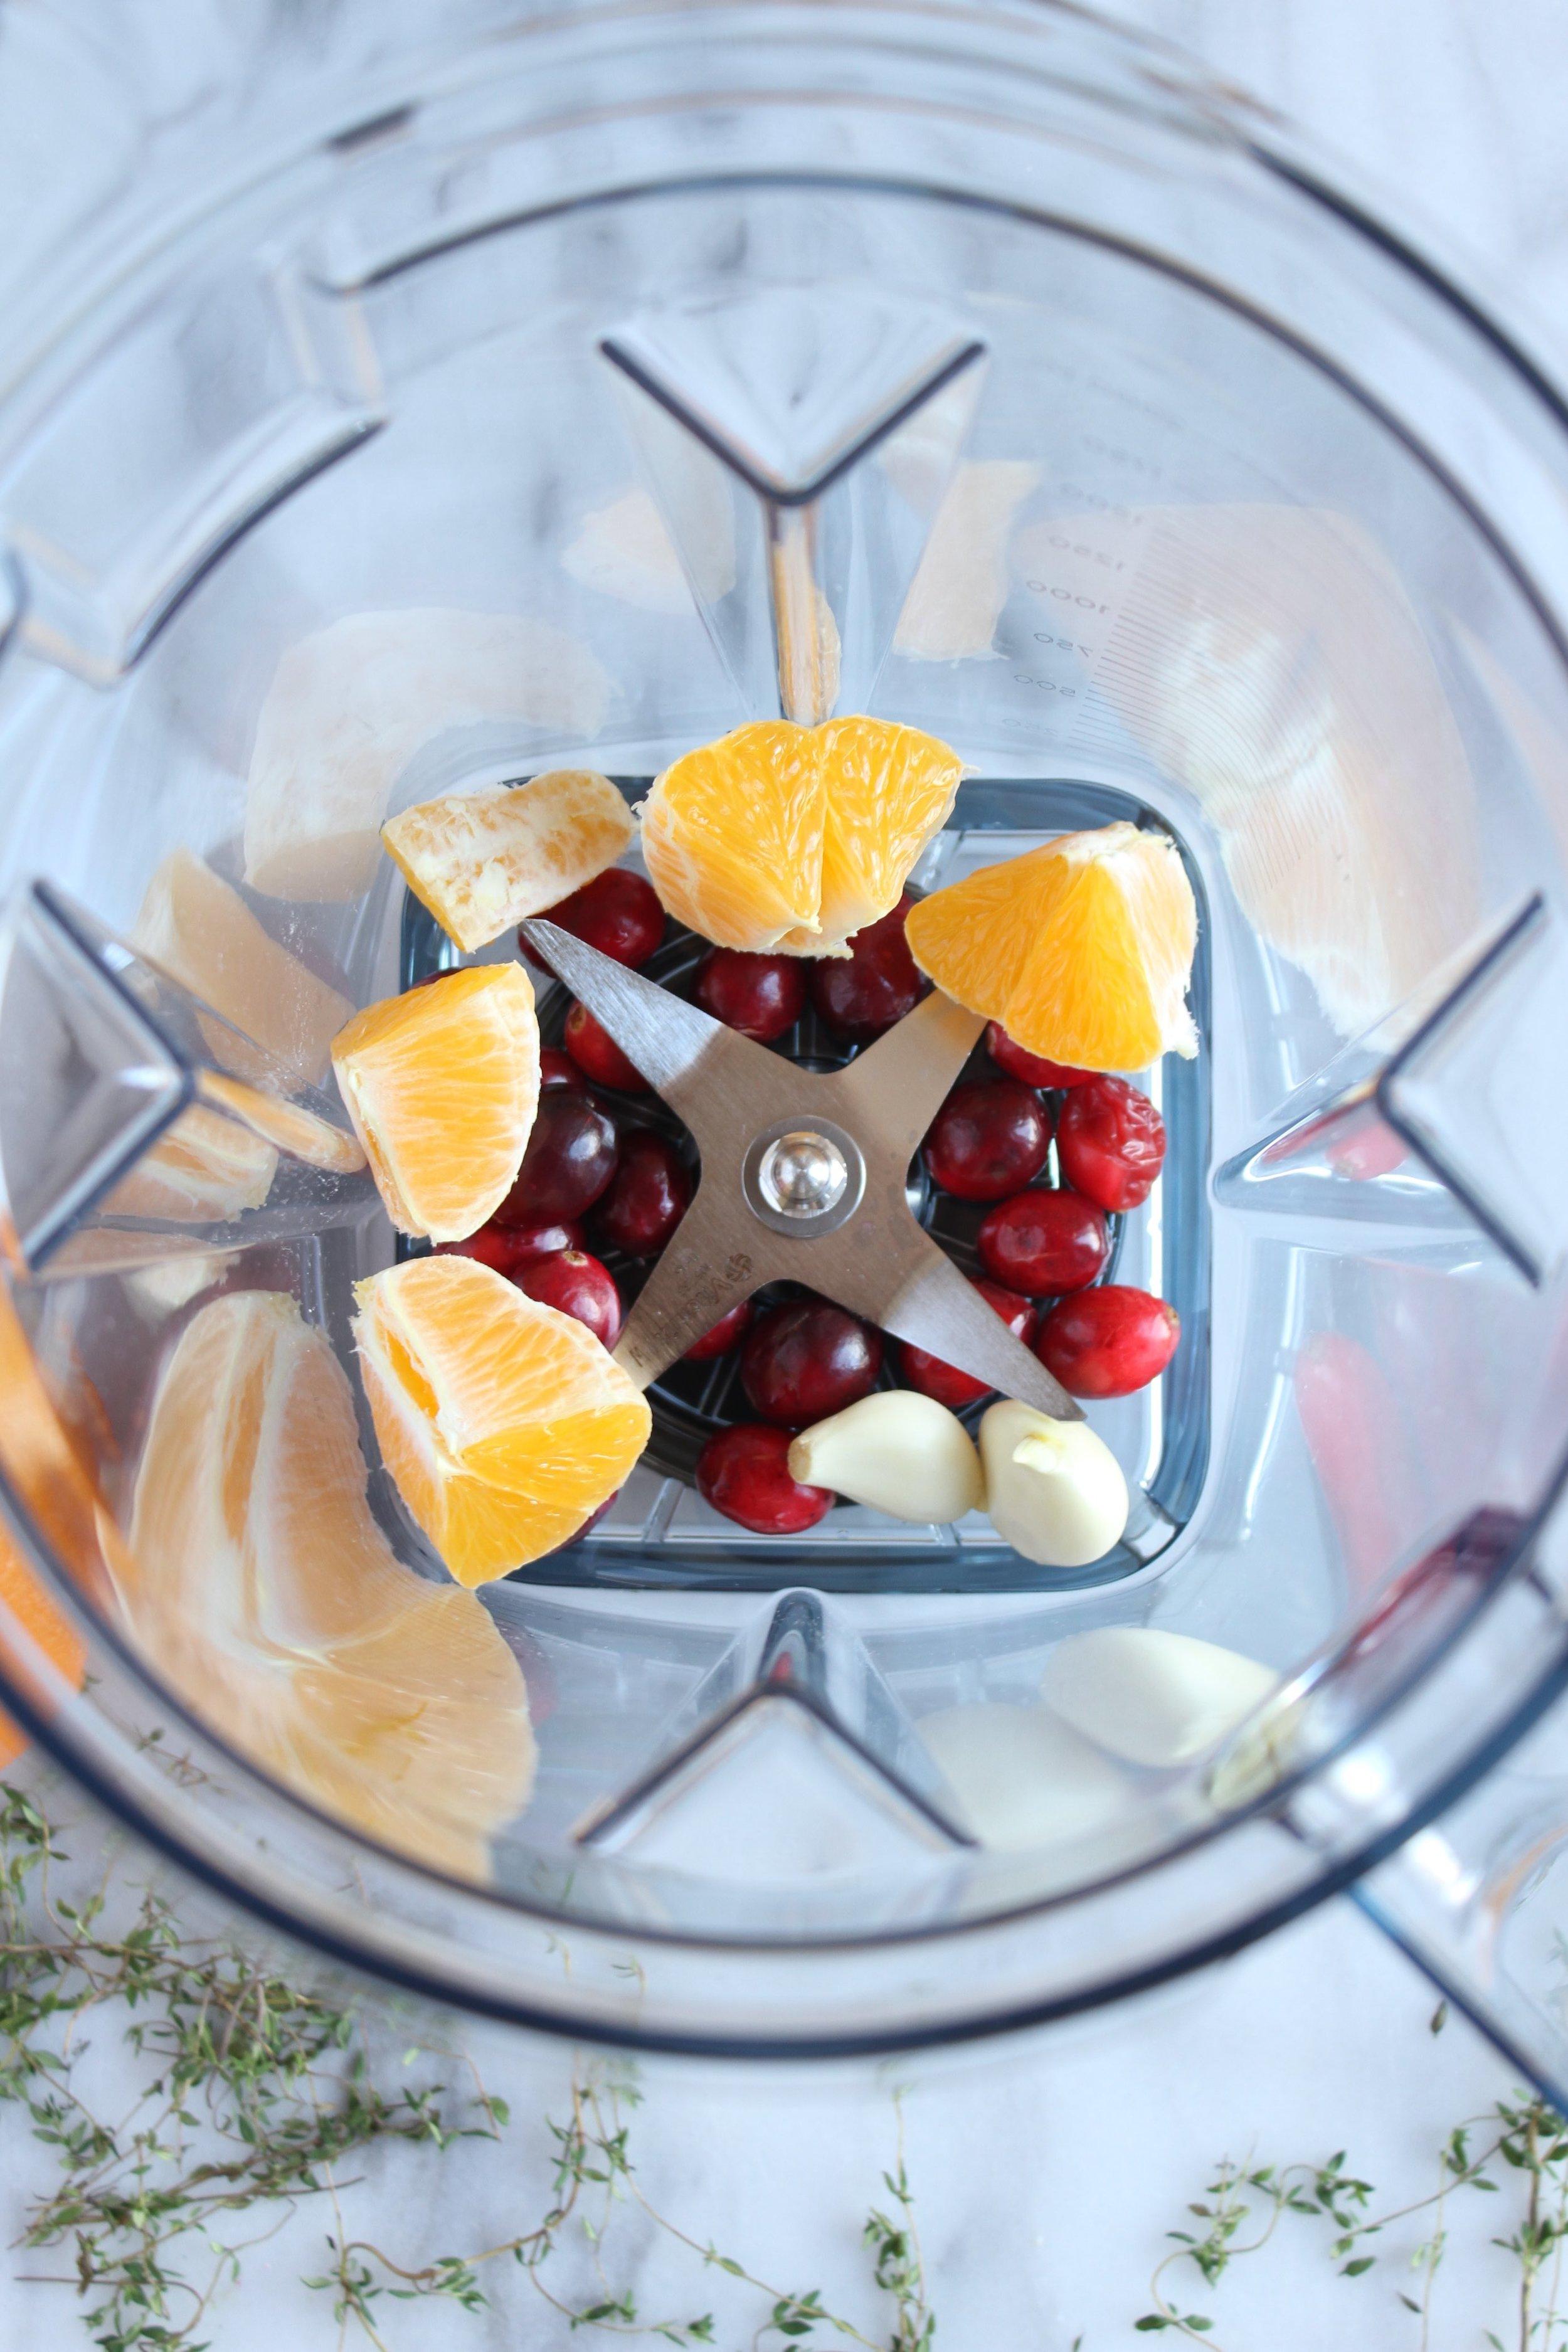 Roasted Cranberry Orange Maple Chicken w:Vitamix x Living Minnaly _1.jpg